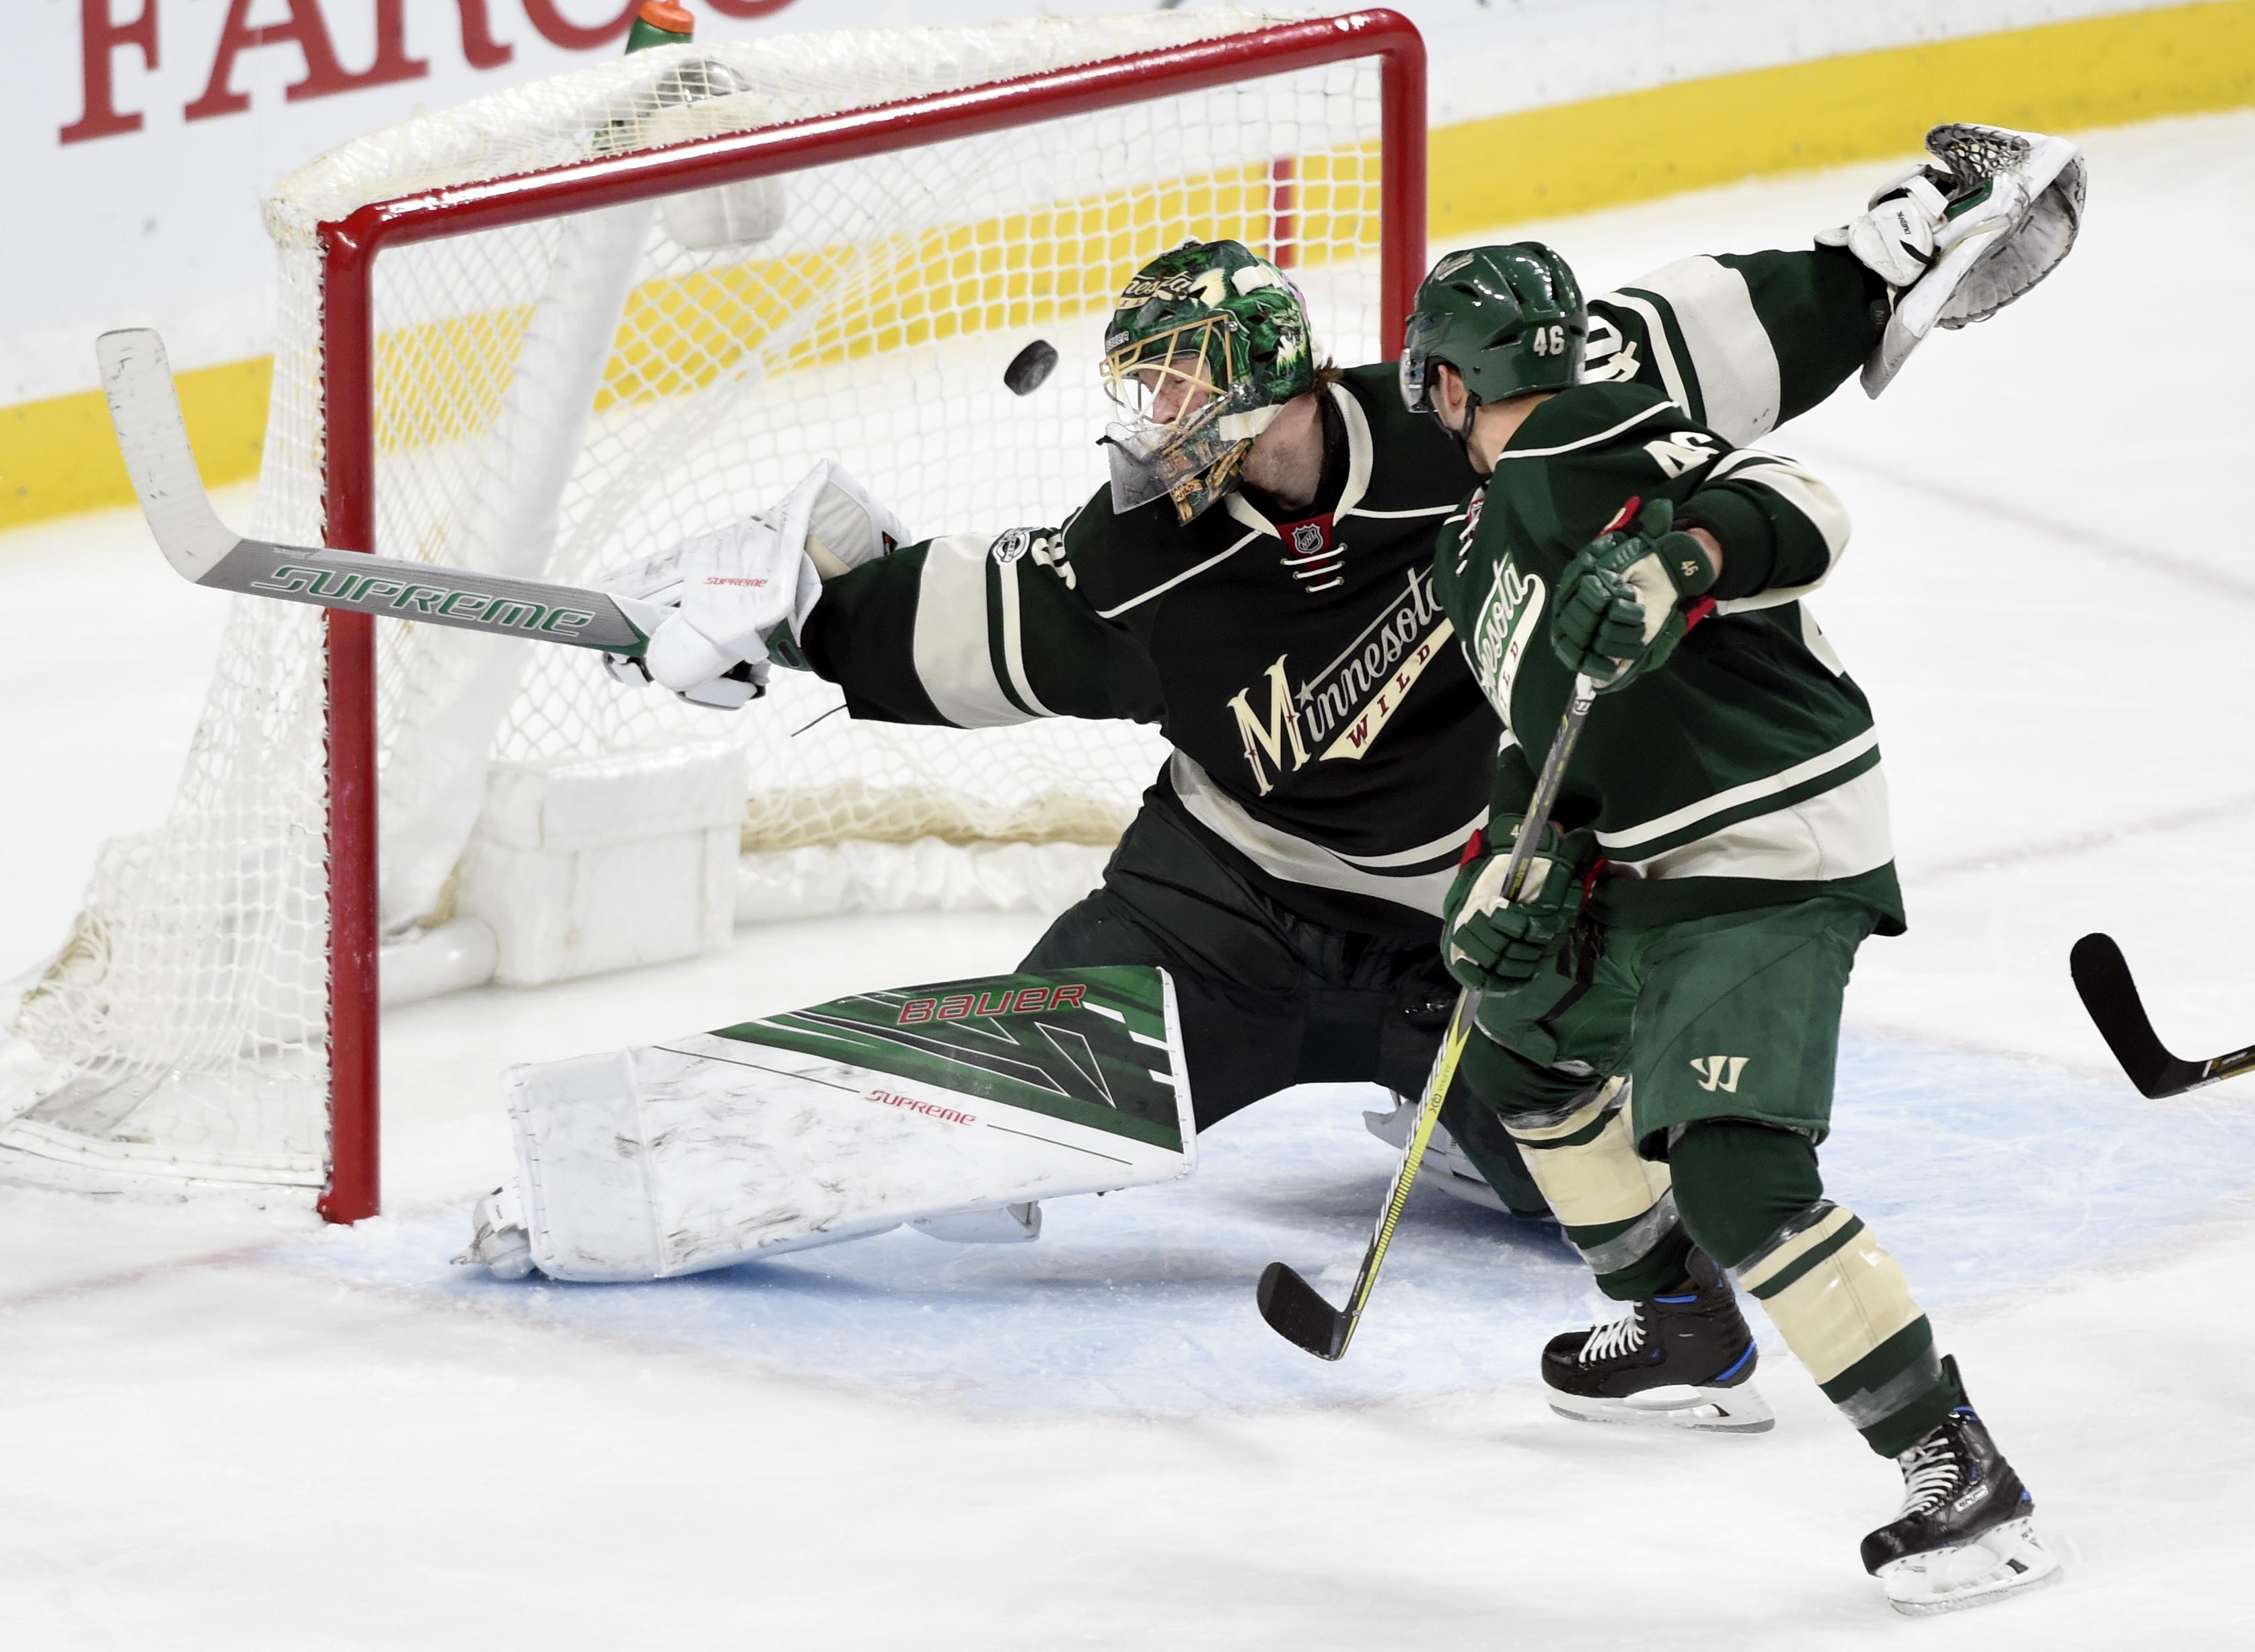 06a2706d985 Minnesota Wild goalie Devan Dubnyk (40) and defenseman Jared Spurgeon (46)  watch